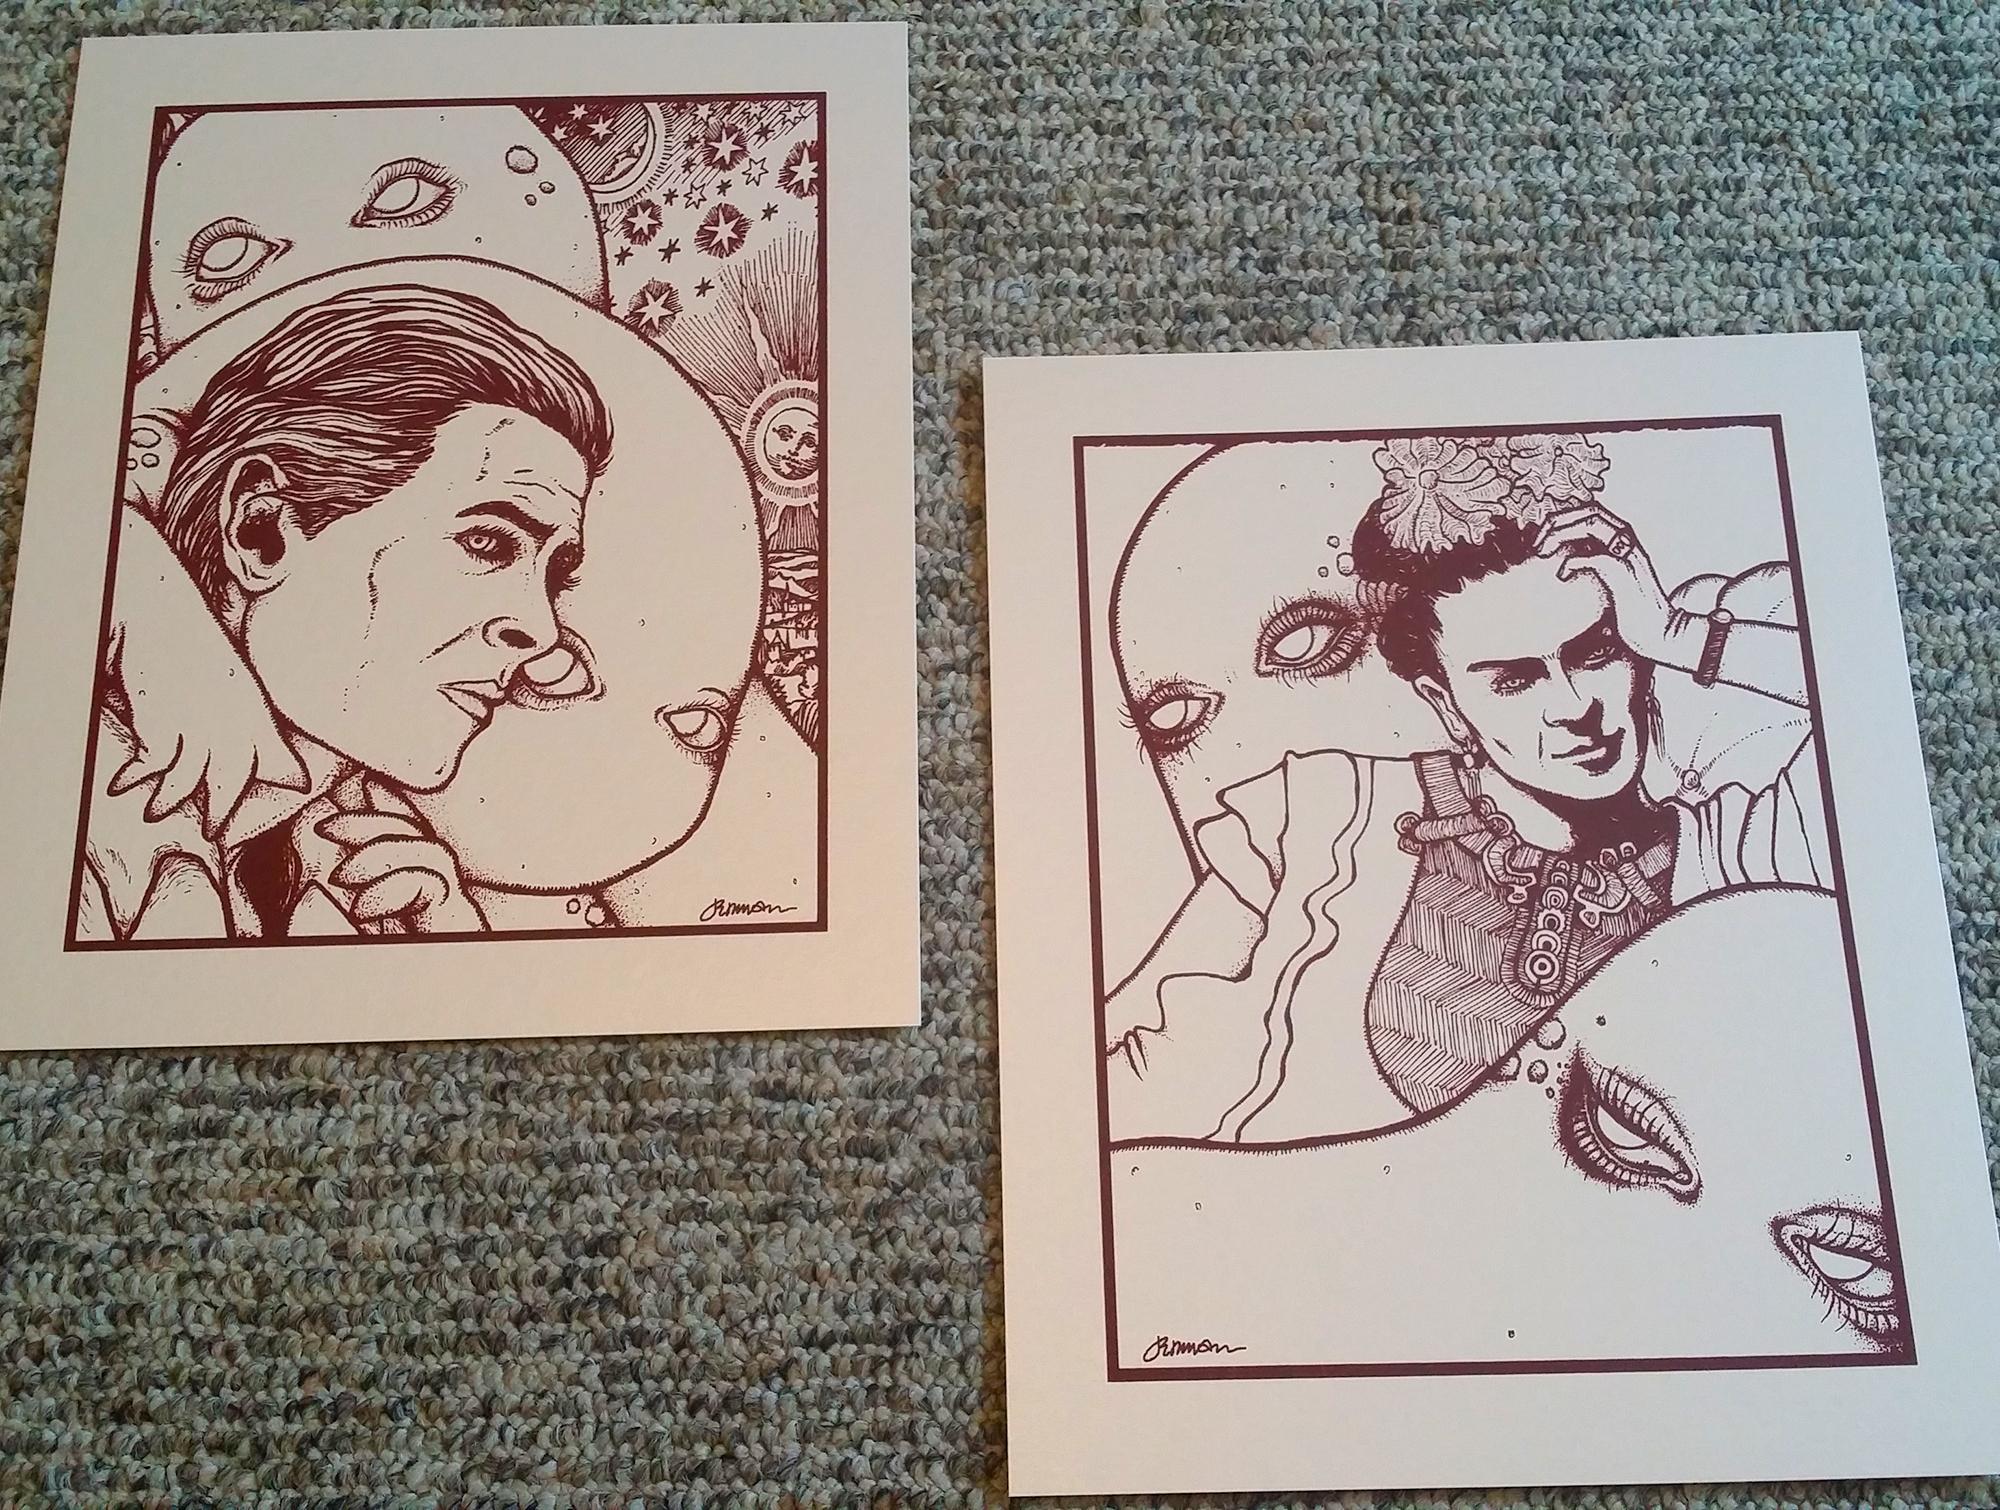 NEW - 'Melancholy' (prints #'s 1 & 2: 'David' and 'Frida') - VARIANTS & KEYLINES